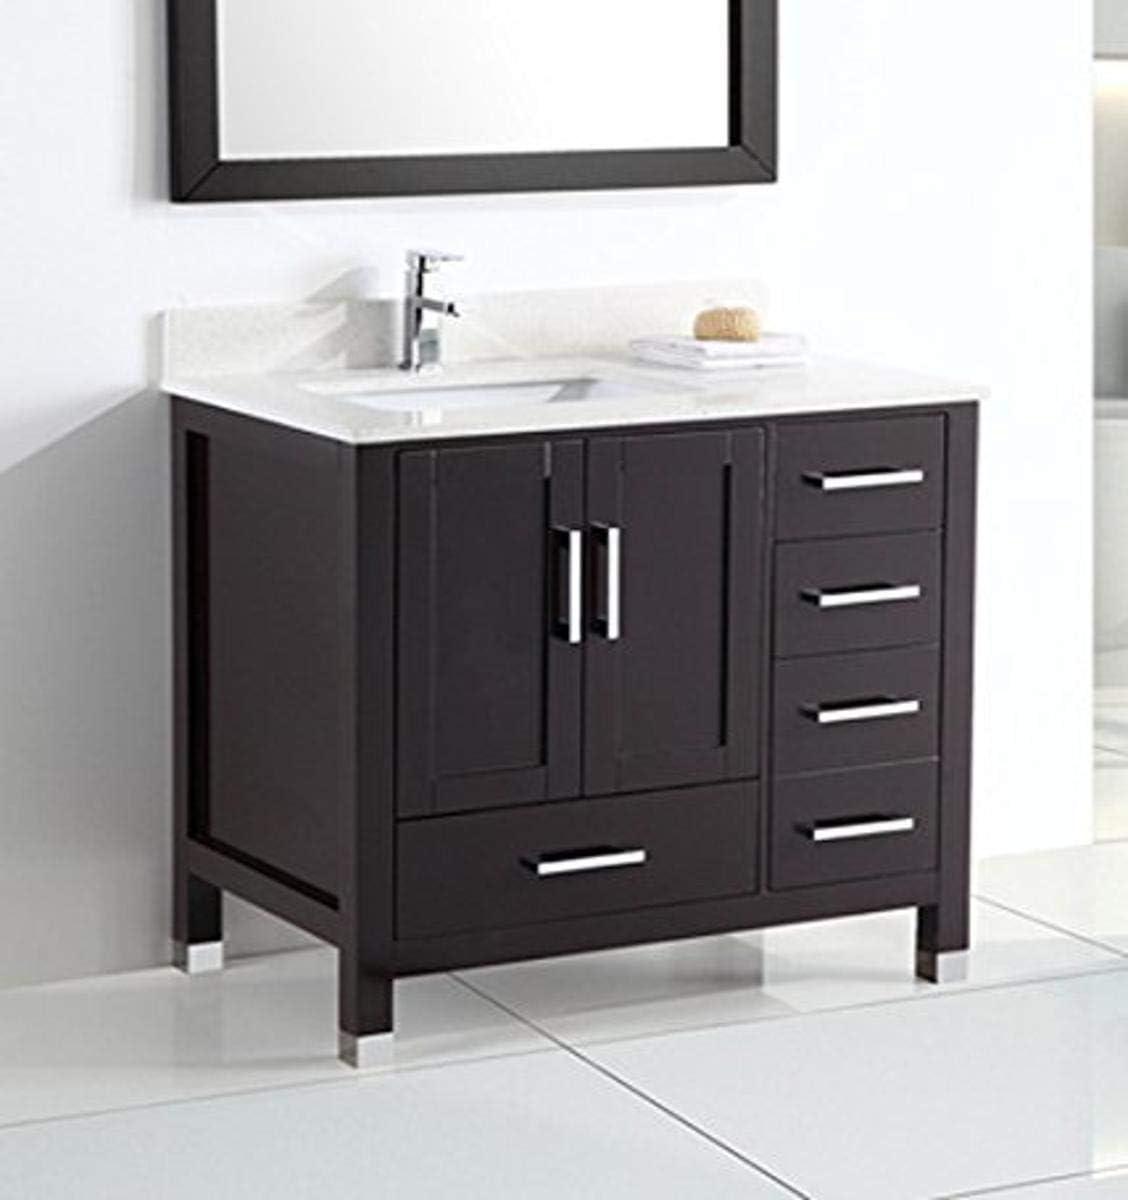 Belvedere Bath L9030 Bathroom Vanity 36 W X 22 D X 34 H Espresso Amazon Com